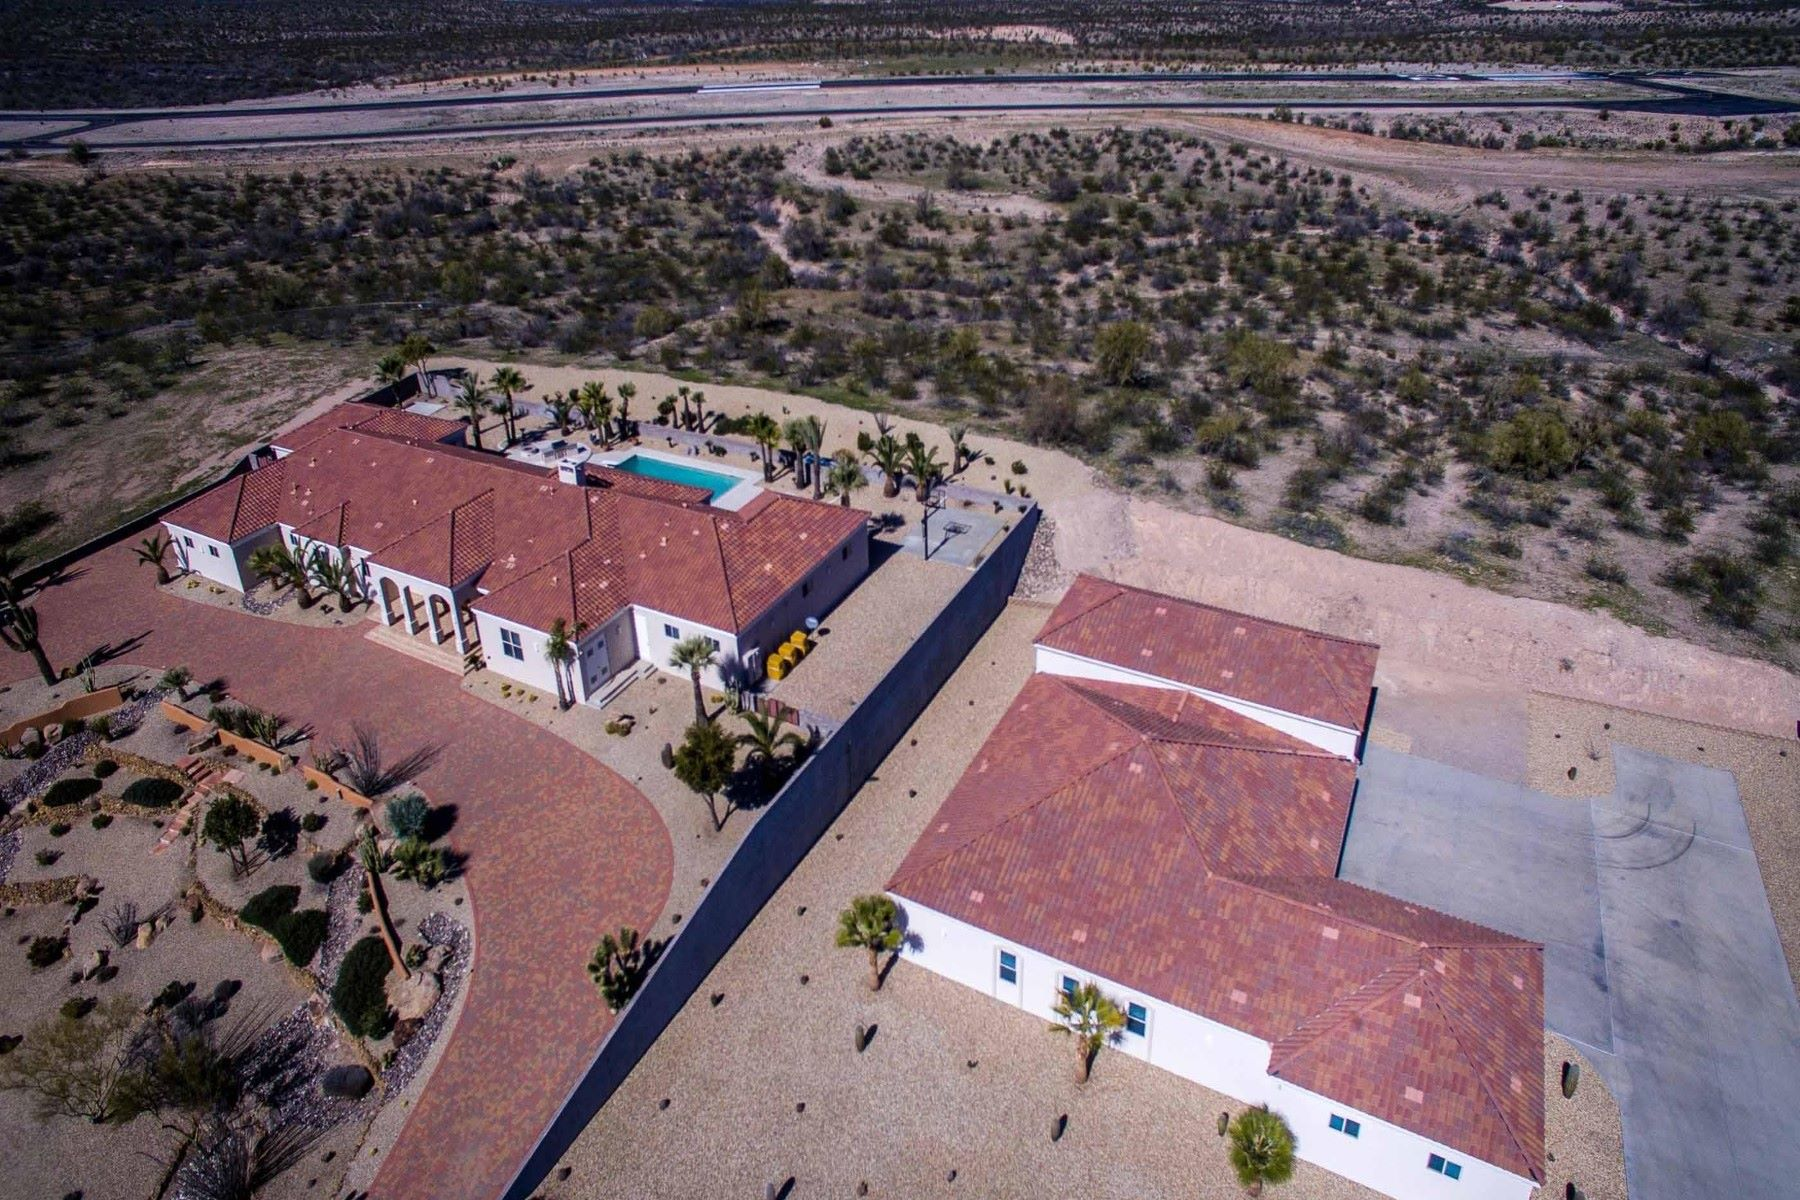 Single Family Homes por un Venta en Dream Estate on the Hill 2590 W PERCHERON RD Wickenburg, Arizona 85390 Estados Unidos